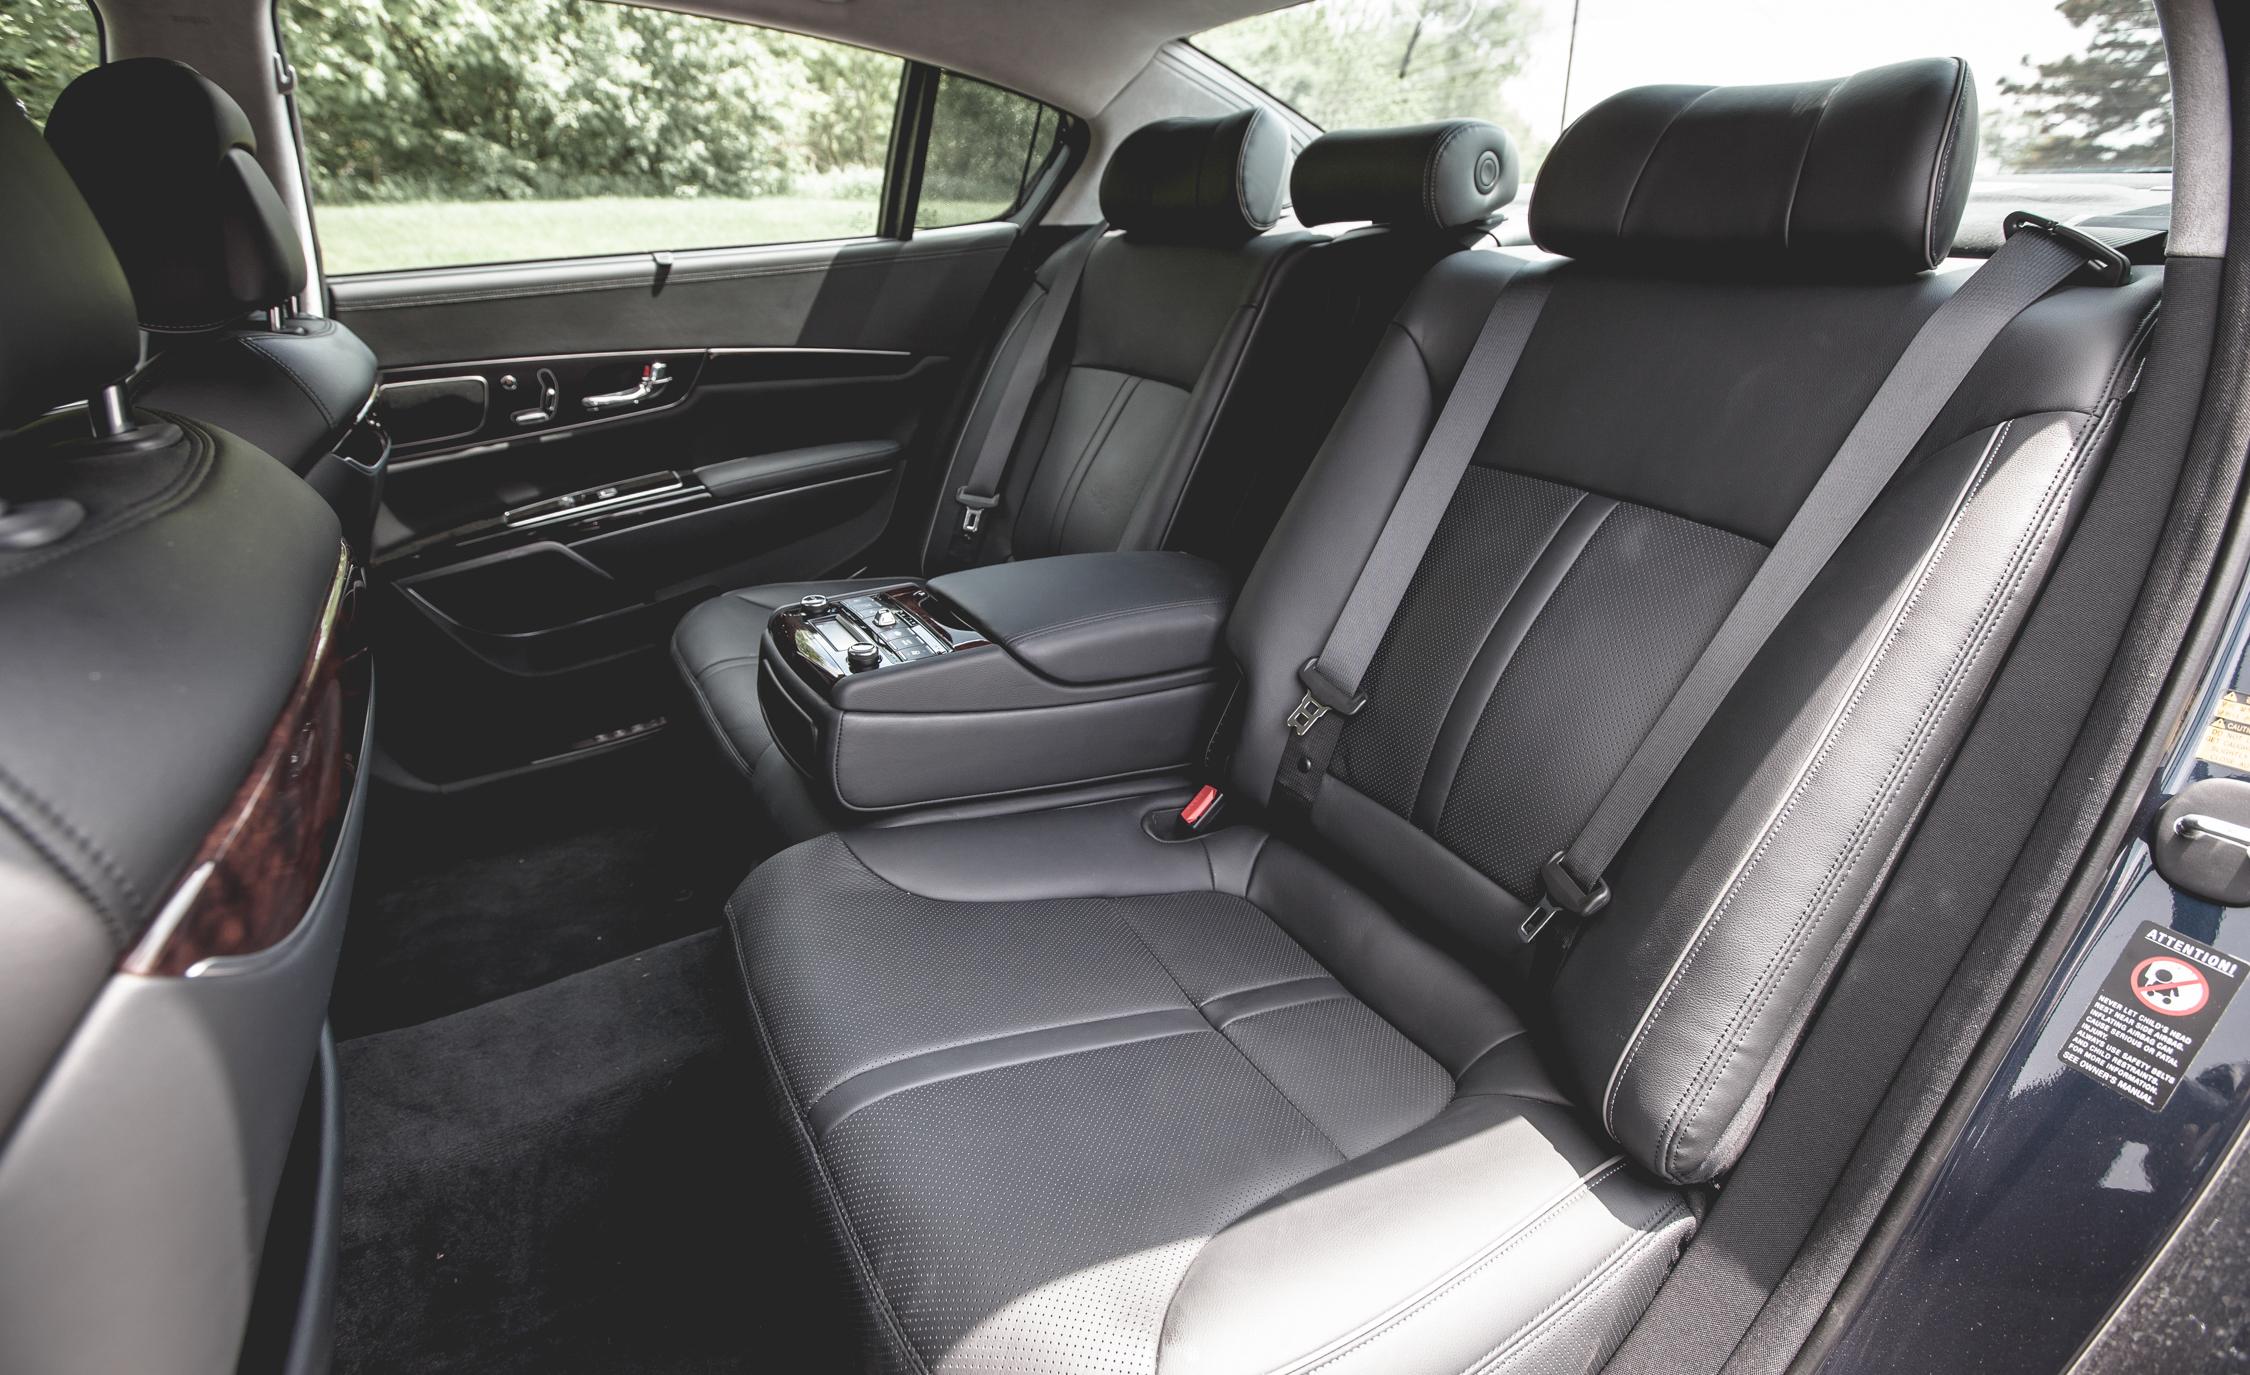 2015 Kia K900 Interior Rear Passenger Seats